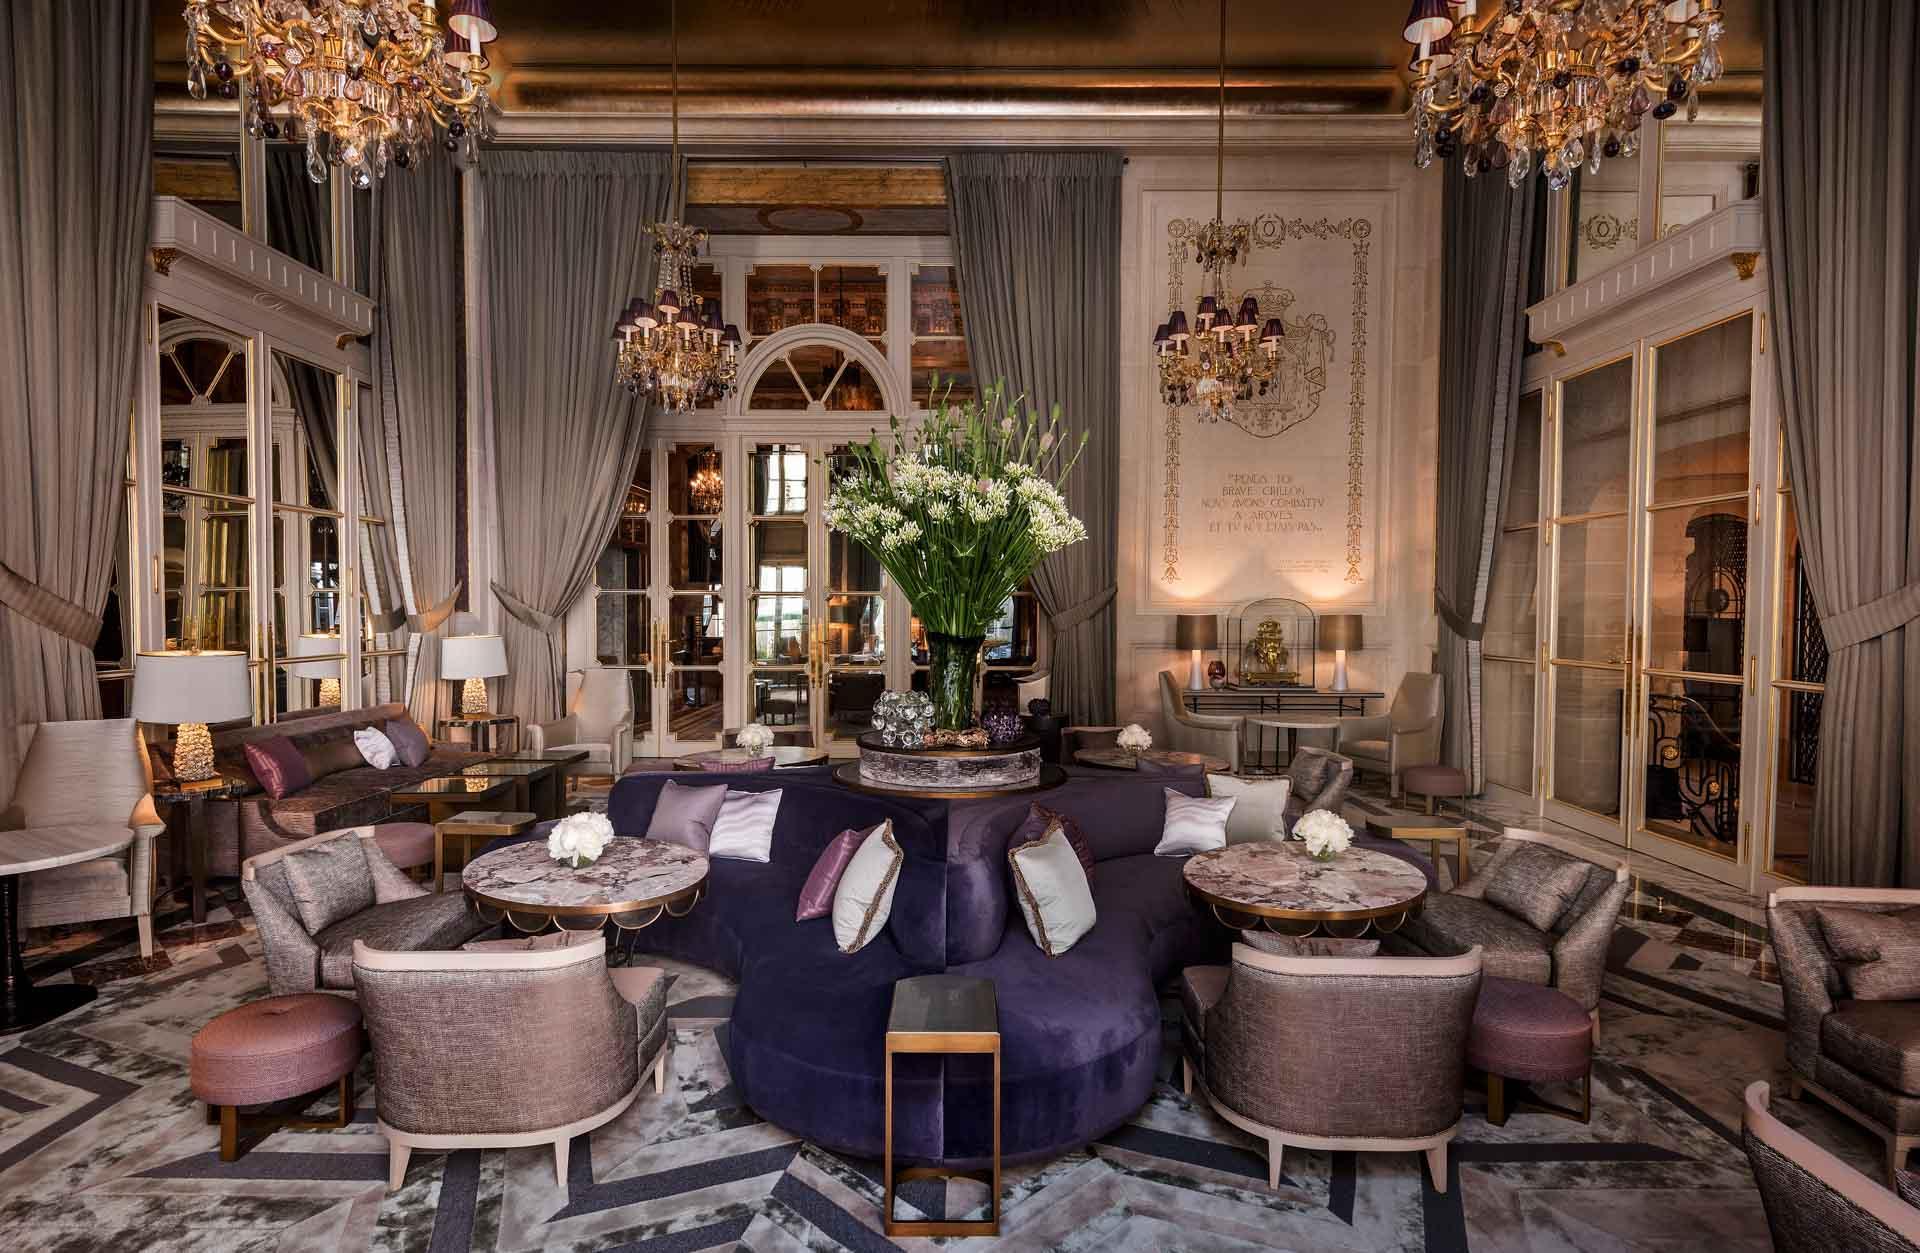 Le Jardin d'hiver à l'Hôtel de Crillon © Hôtel de Crillon, A Rosewood Hotel